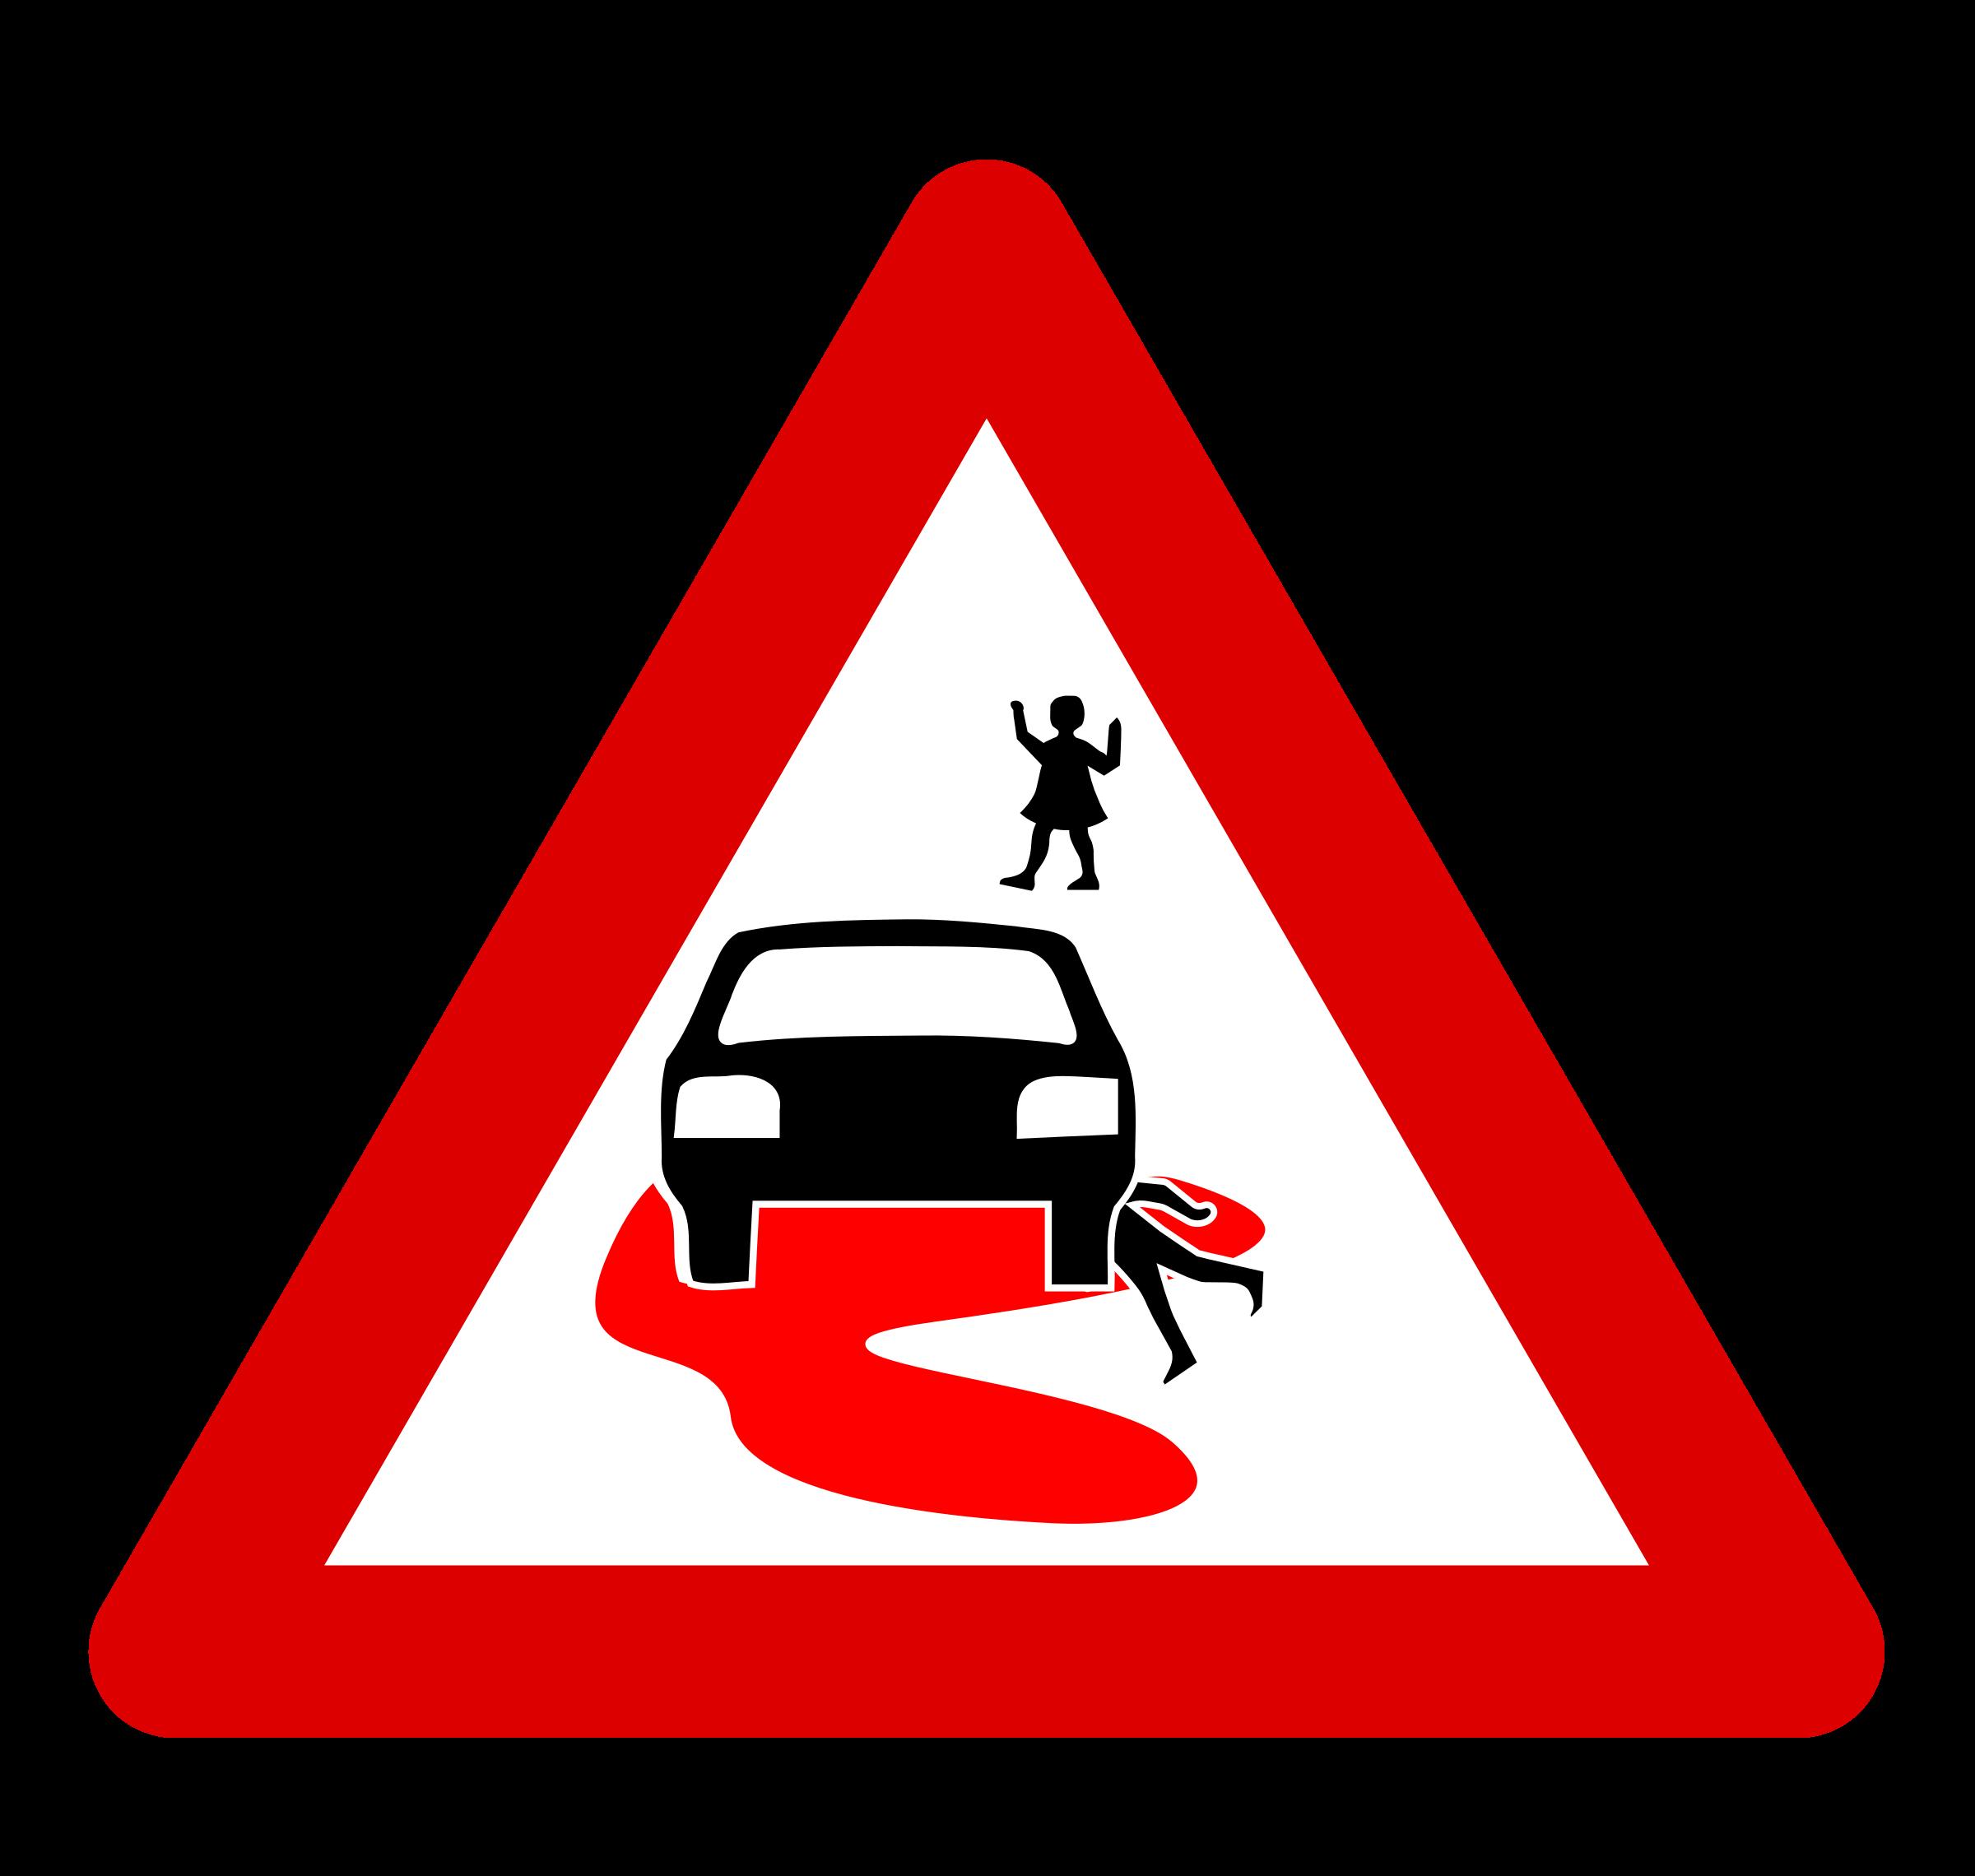 Speed clip art svg freeuse Clipart - speed kills mutrax svg freeuse